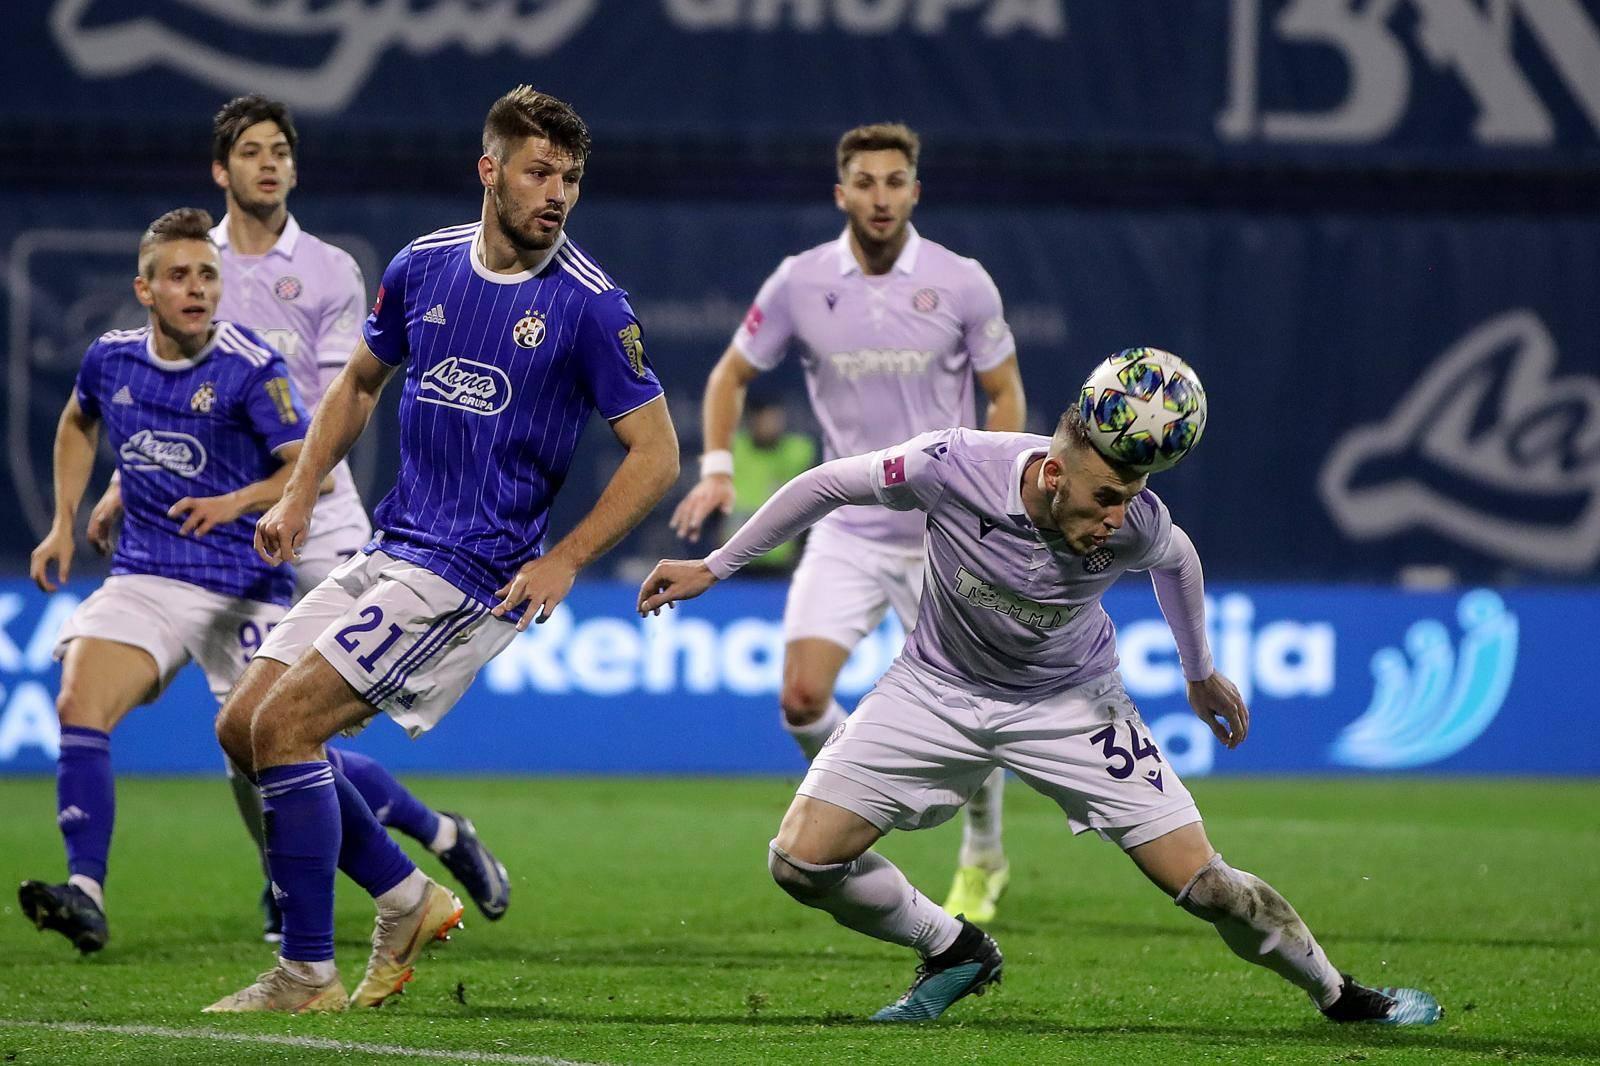 Sretan ti rođendan Hajduče, a Dinamo ti ga čestitao 2021.